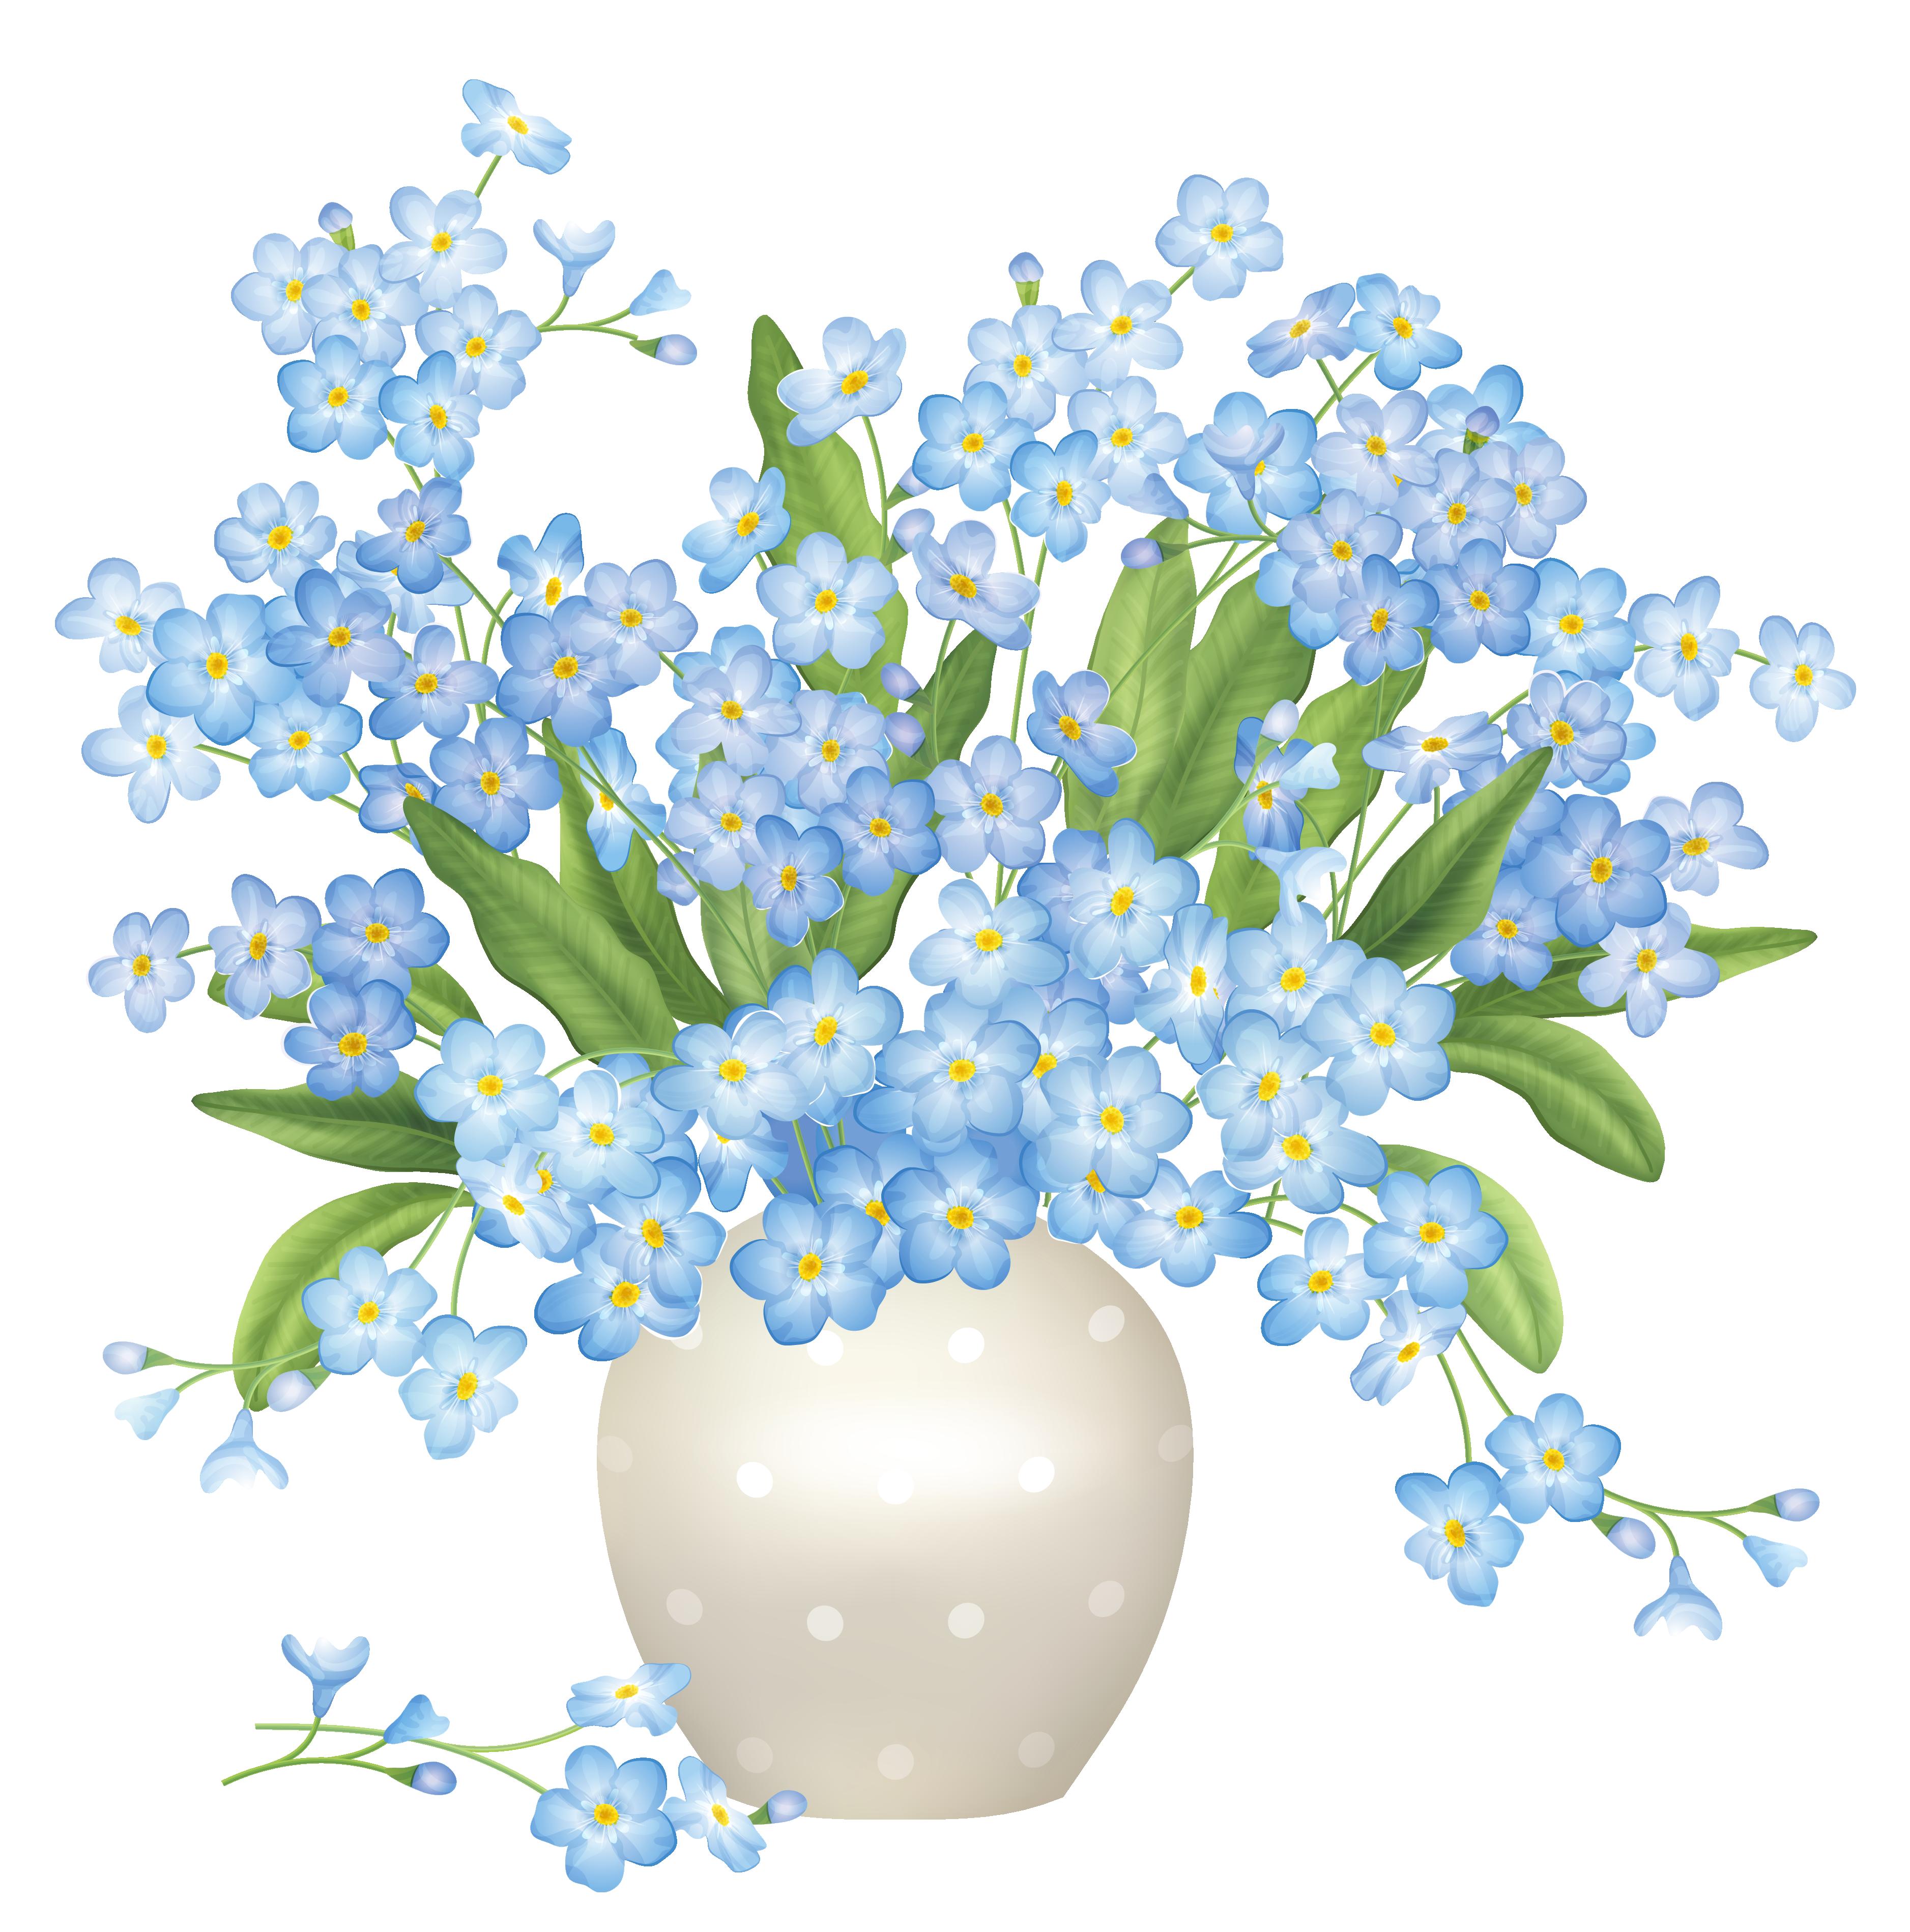 Blue Flowers Vase PNG Clipart.